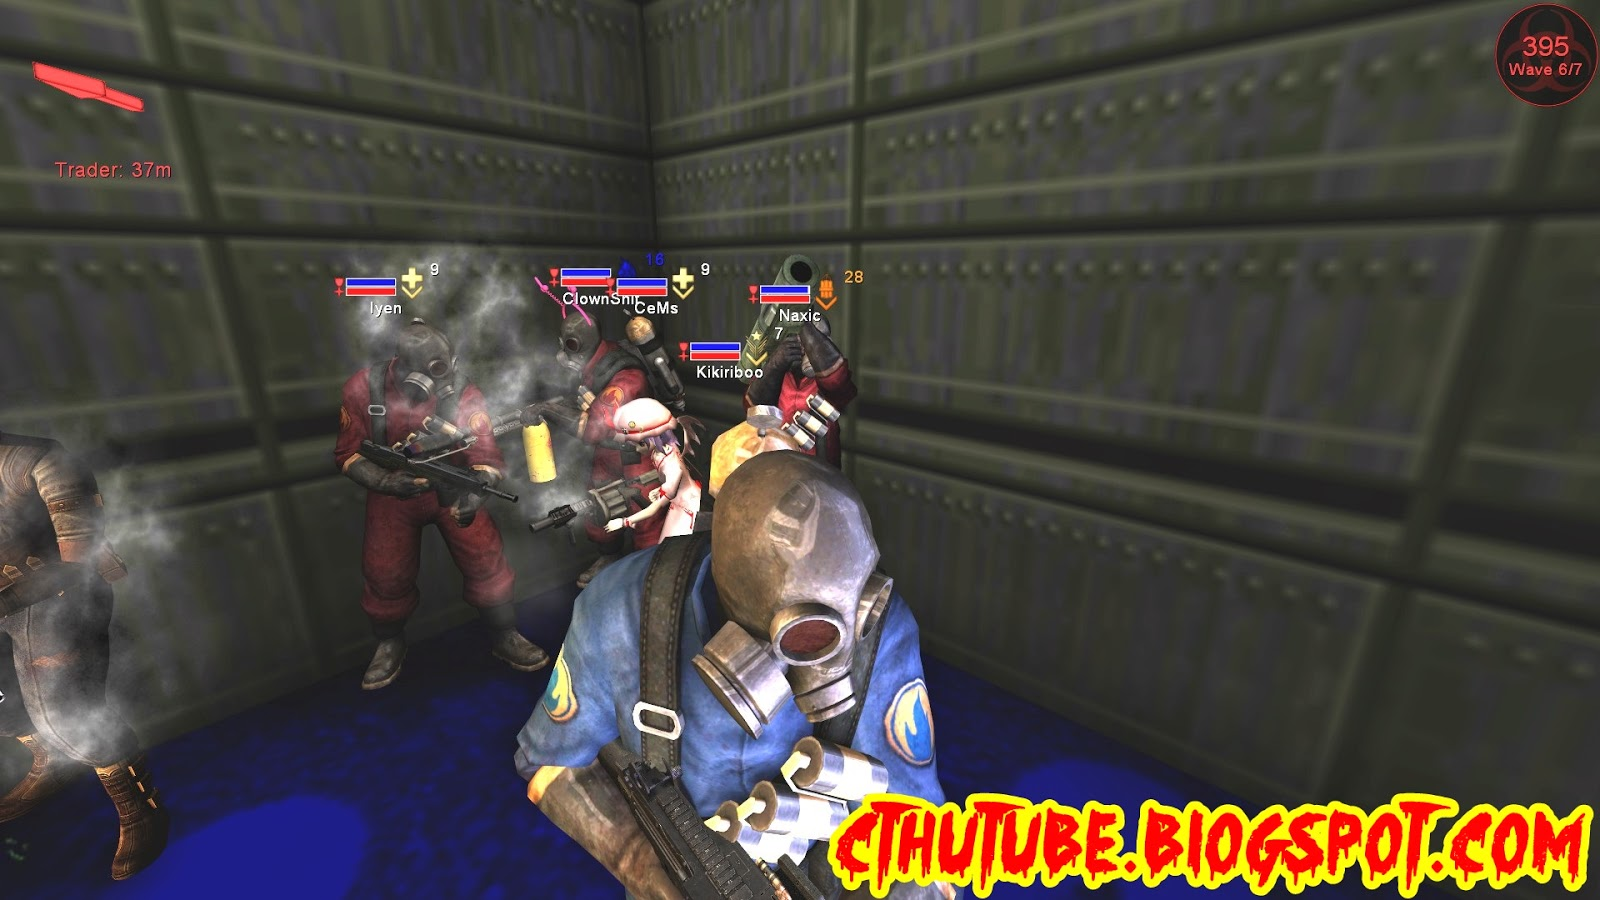 Cthutube killing floor screenshot gallery for 6 12 14 for Killing floor zombies